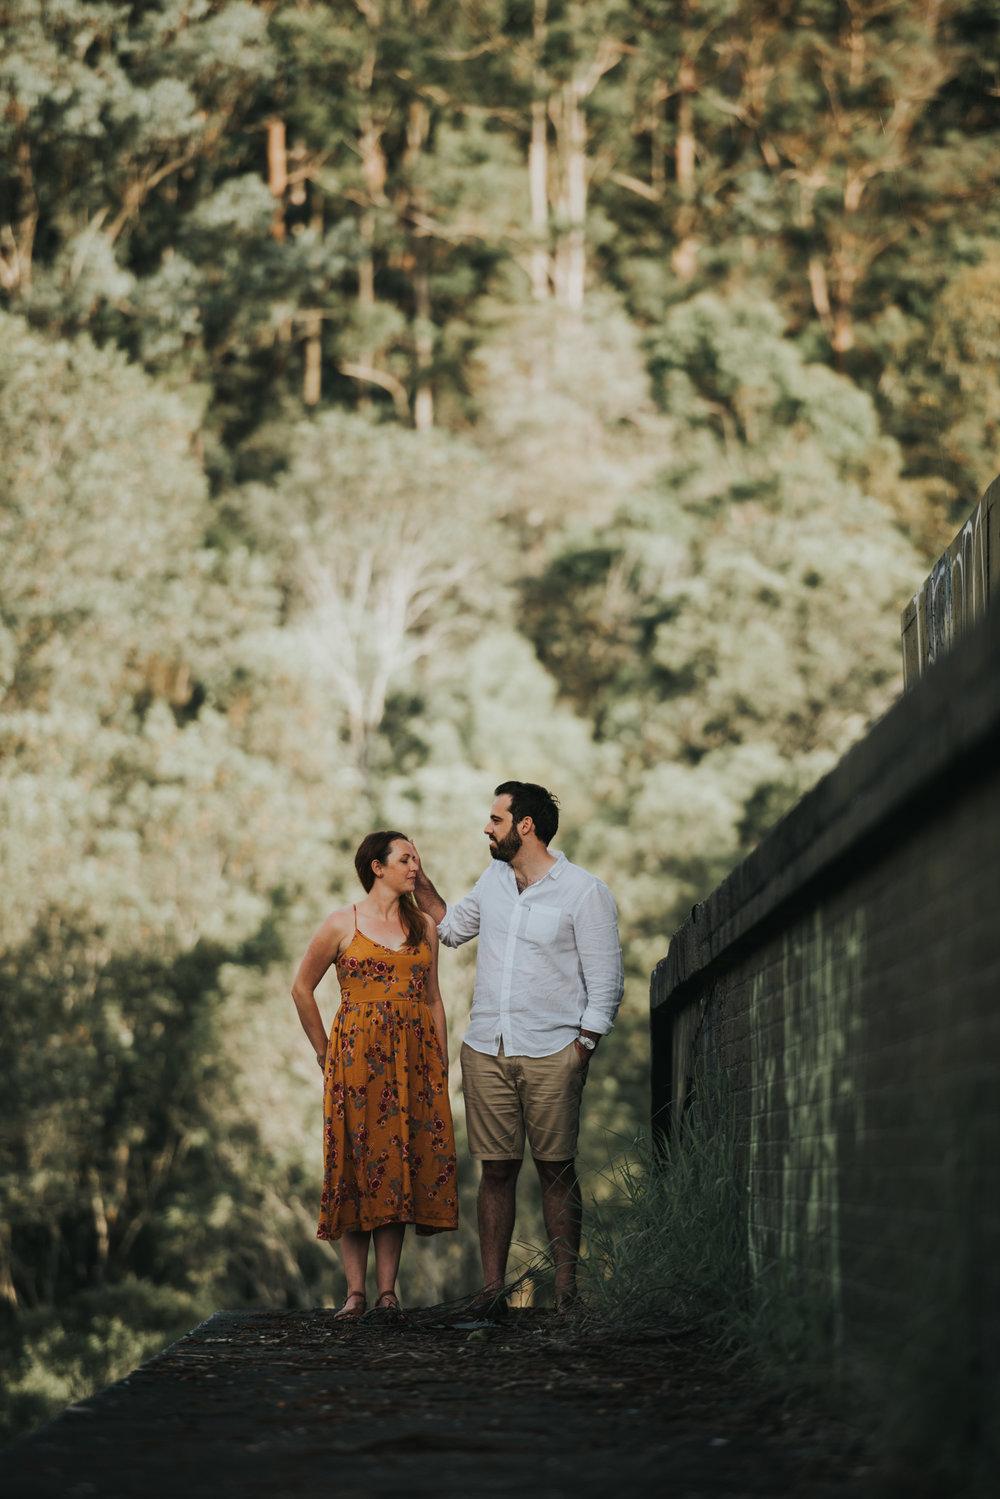 Brisbane Engagement Photographer | Wedding-Elopement Photography-13.jpg